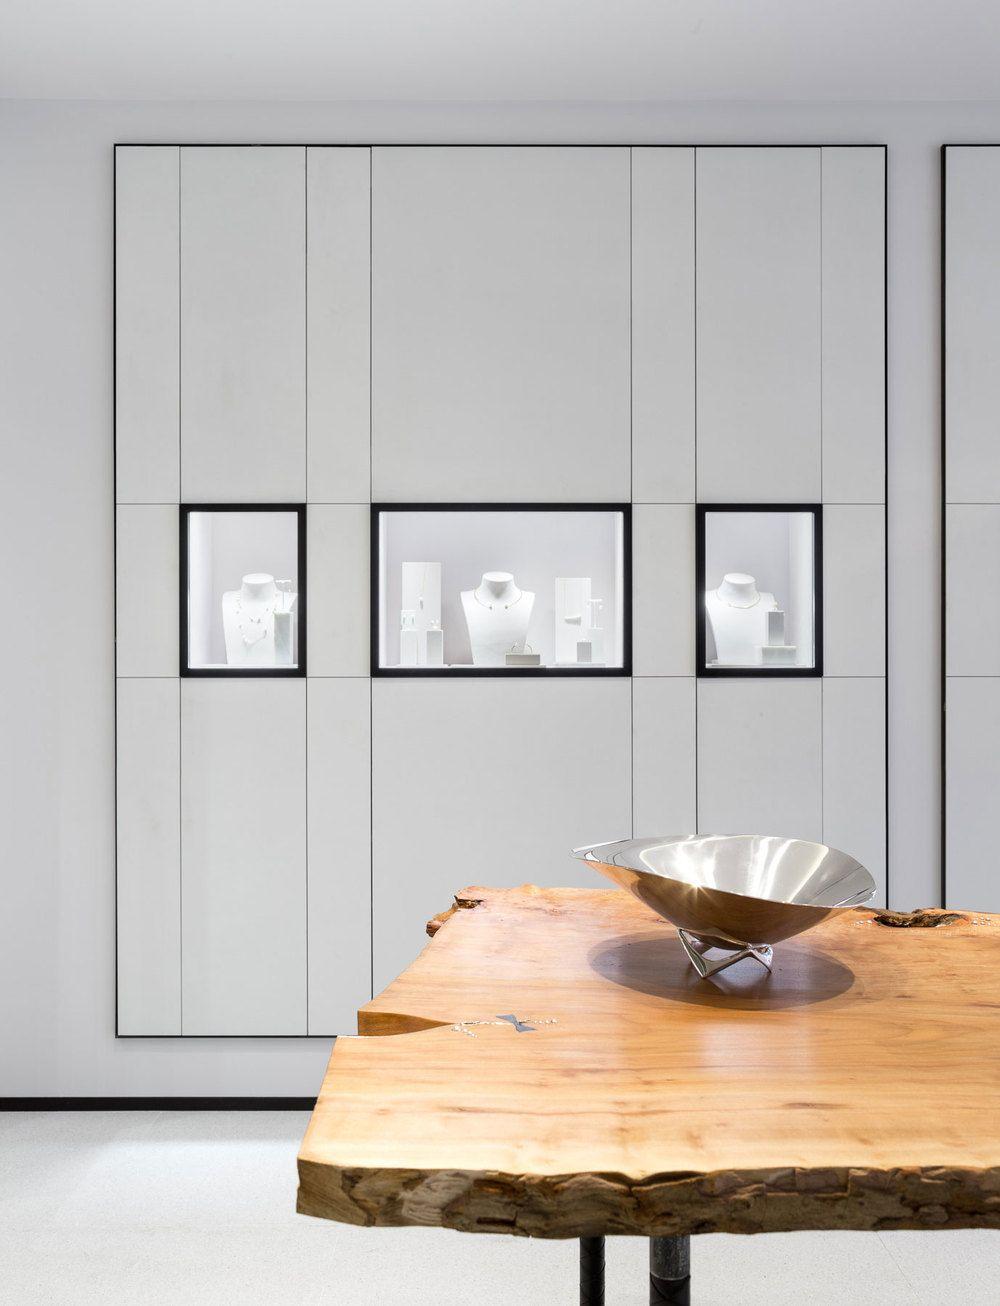 David Thulstrup Designs Symmetrical Space For Georg Jensen: David Thulstrup Designs Symmetrical Space For Georg Jensen